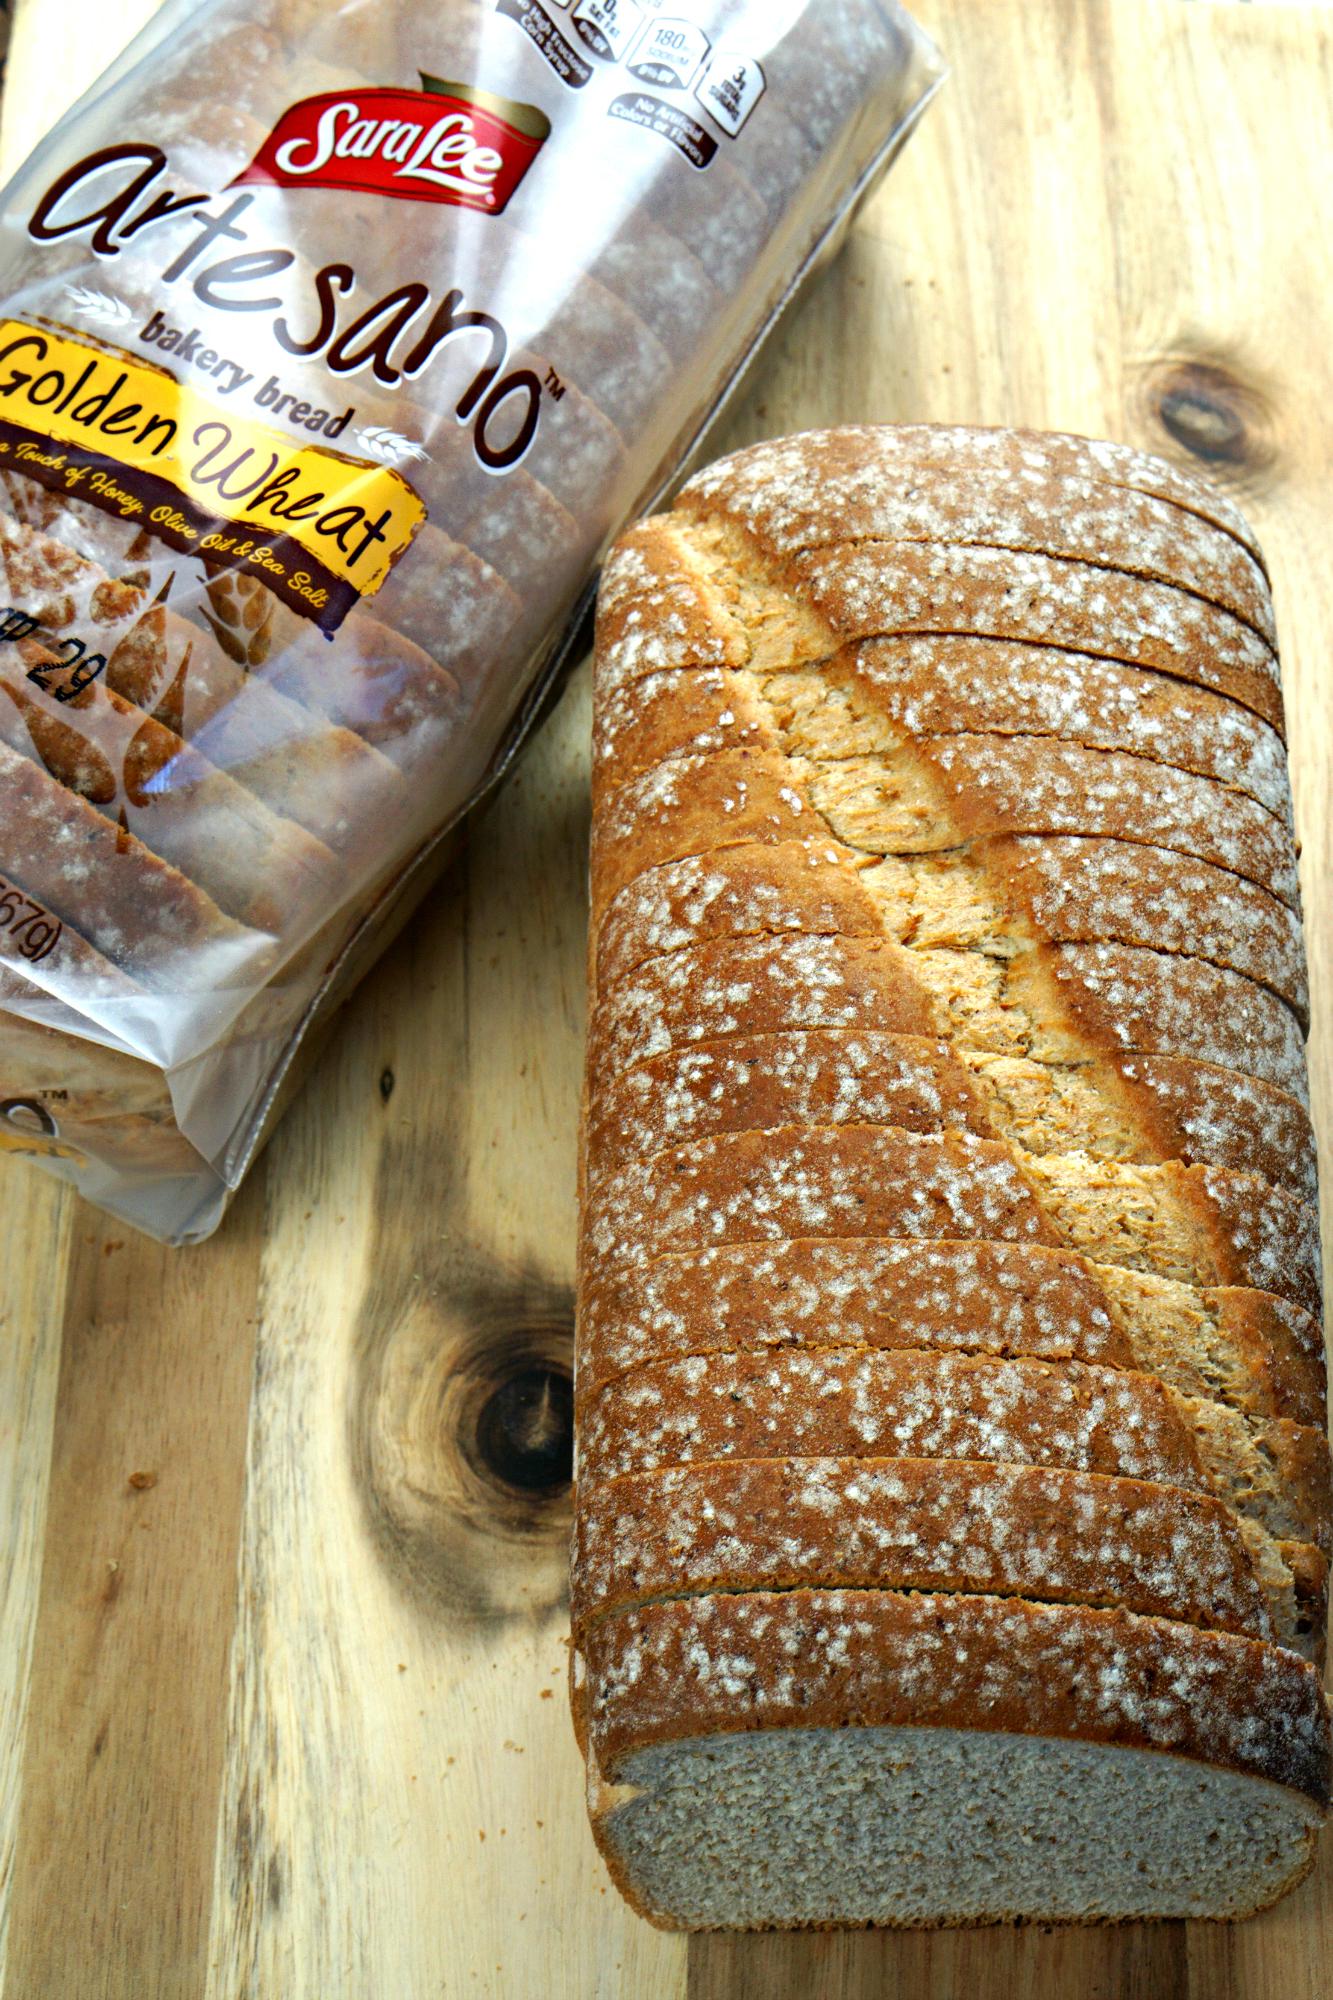 Leftover Grilled Turkey Sandwich | Sara Lee Artesano Golden Wheat Bread